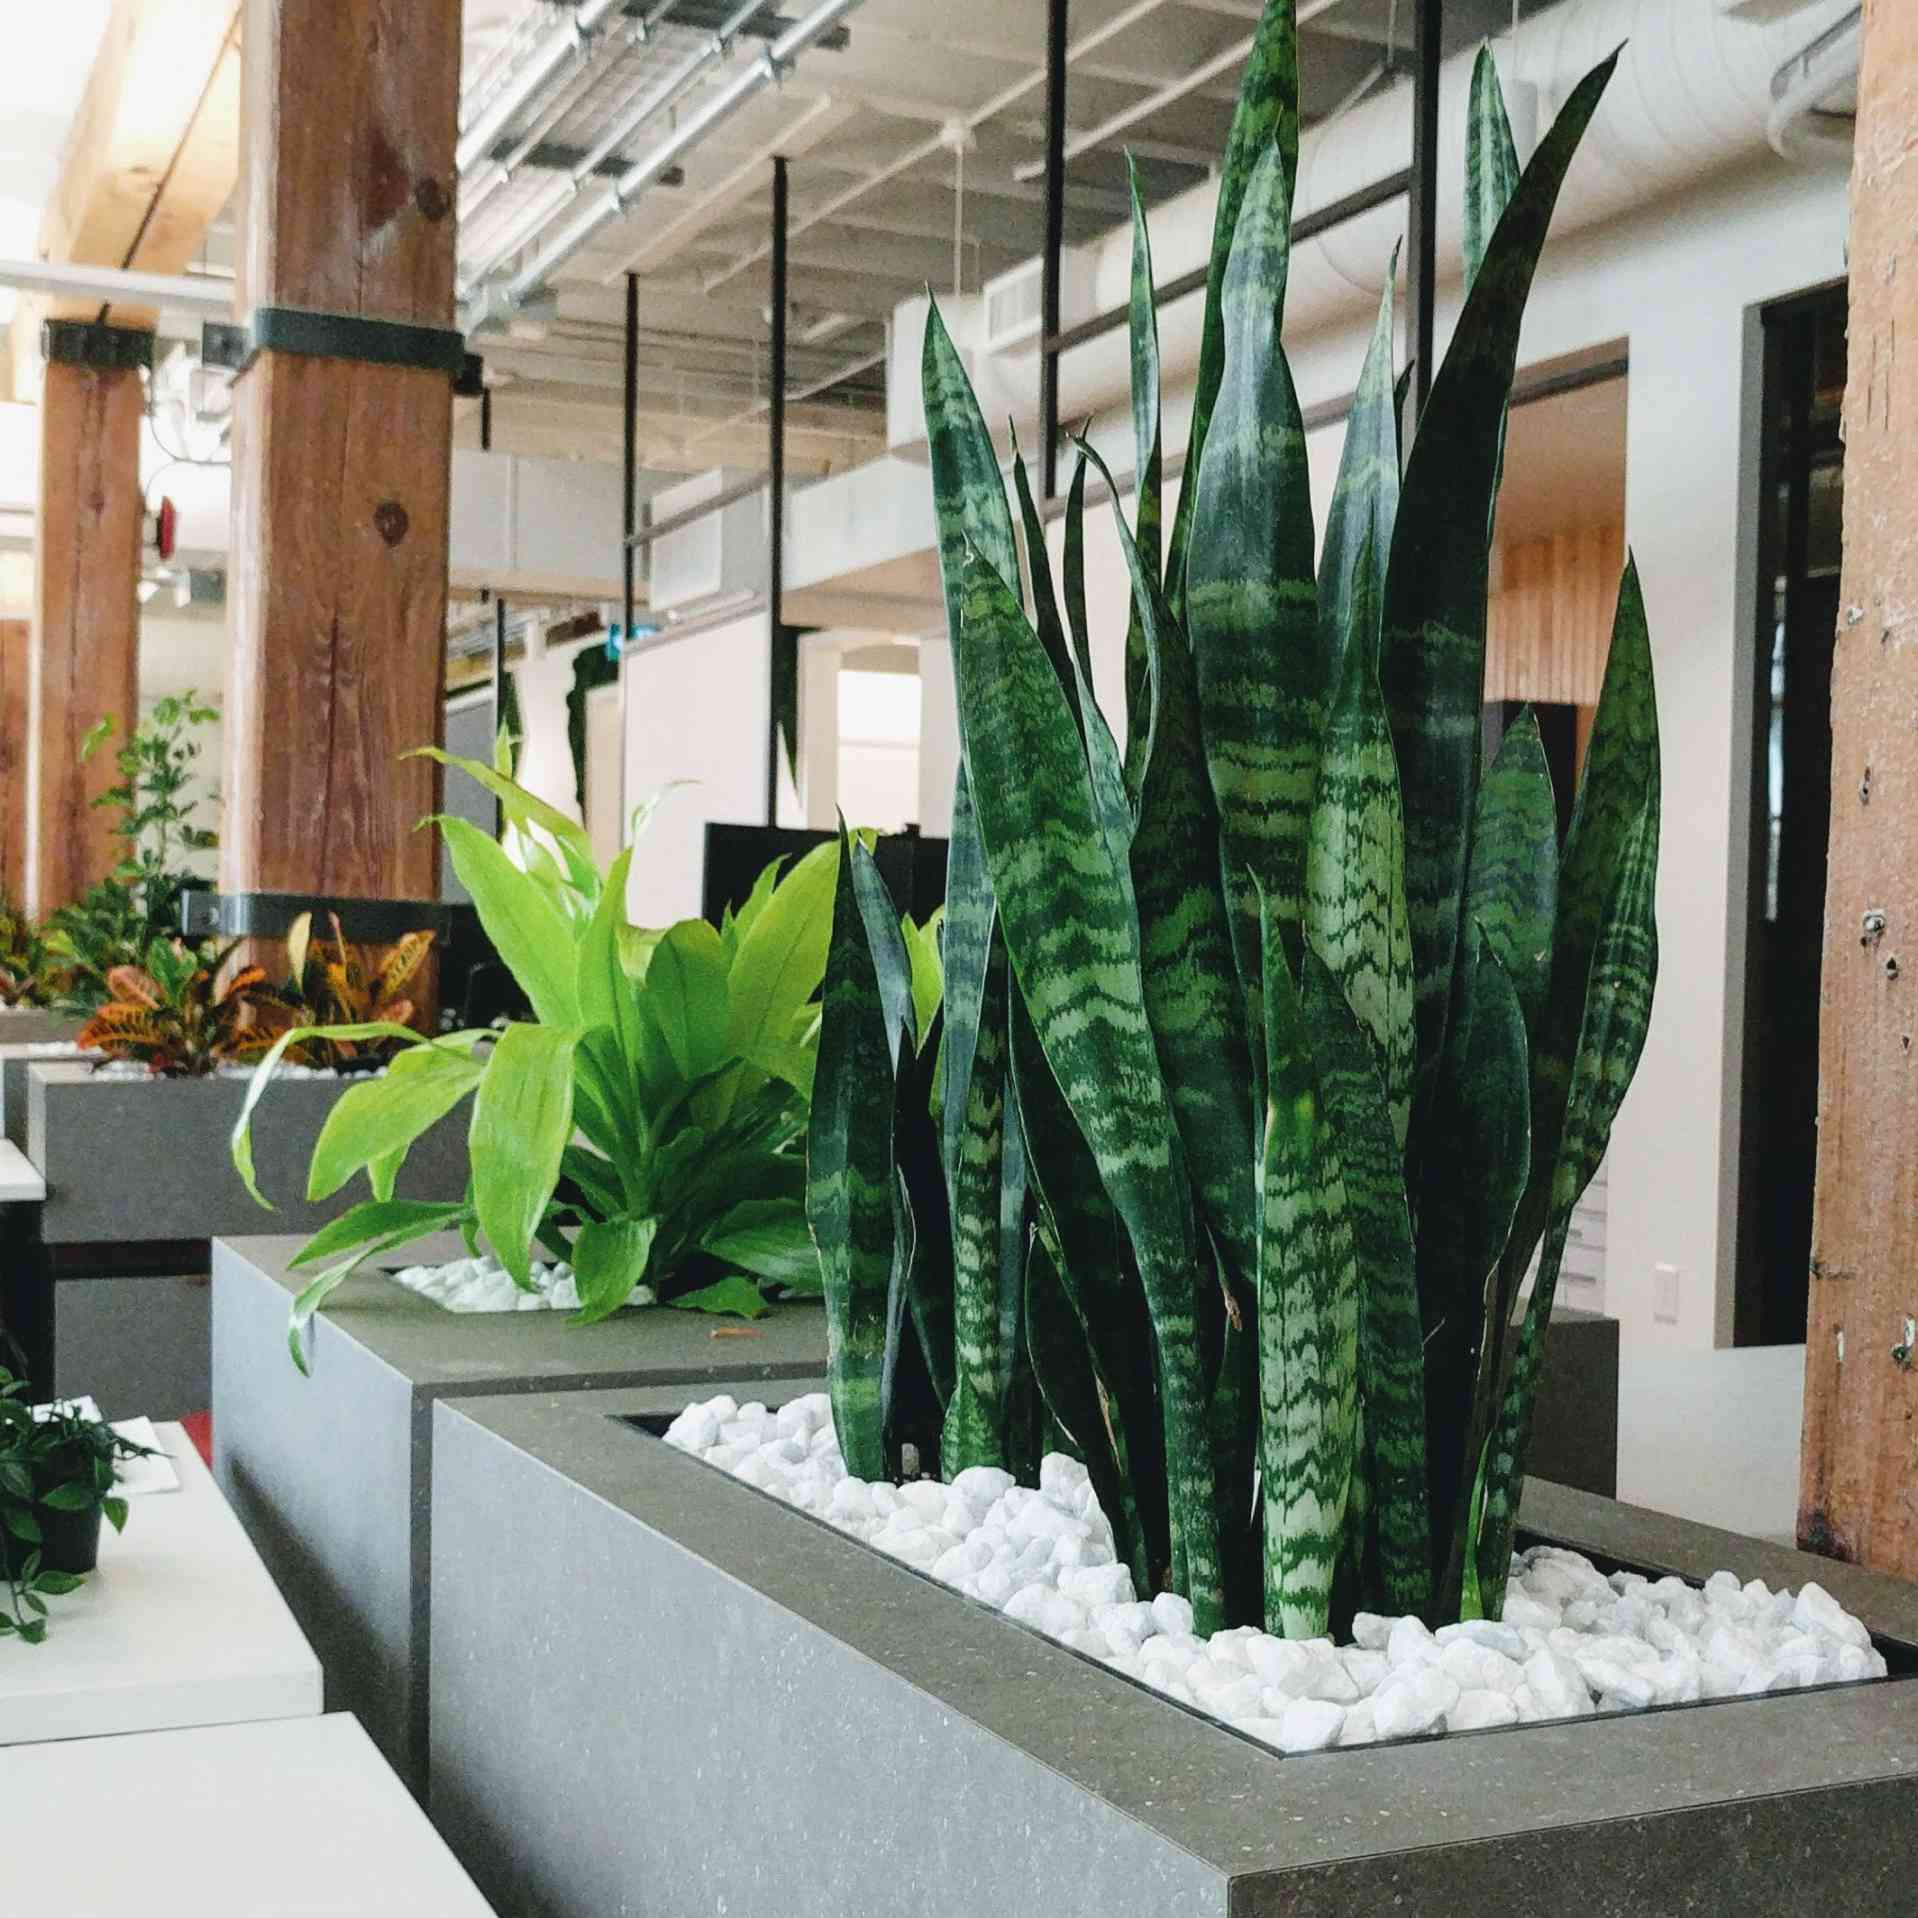 flowerbox indoors